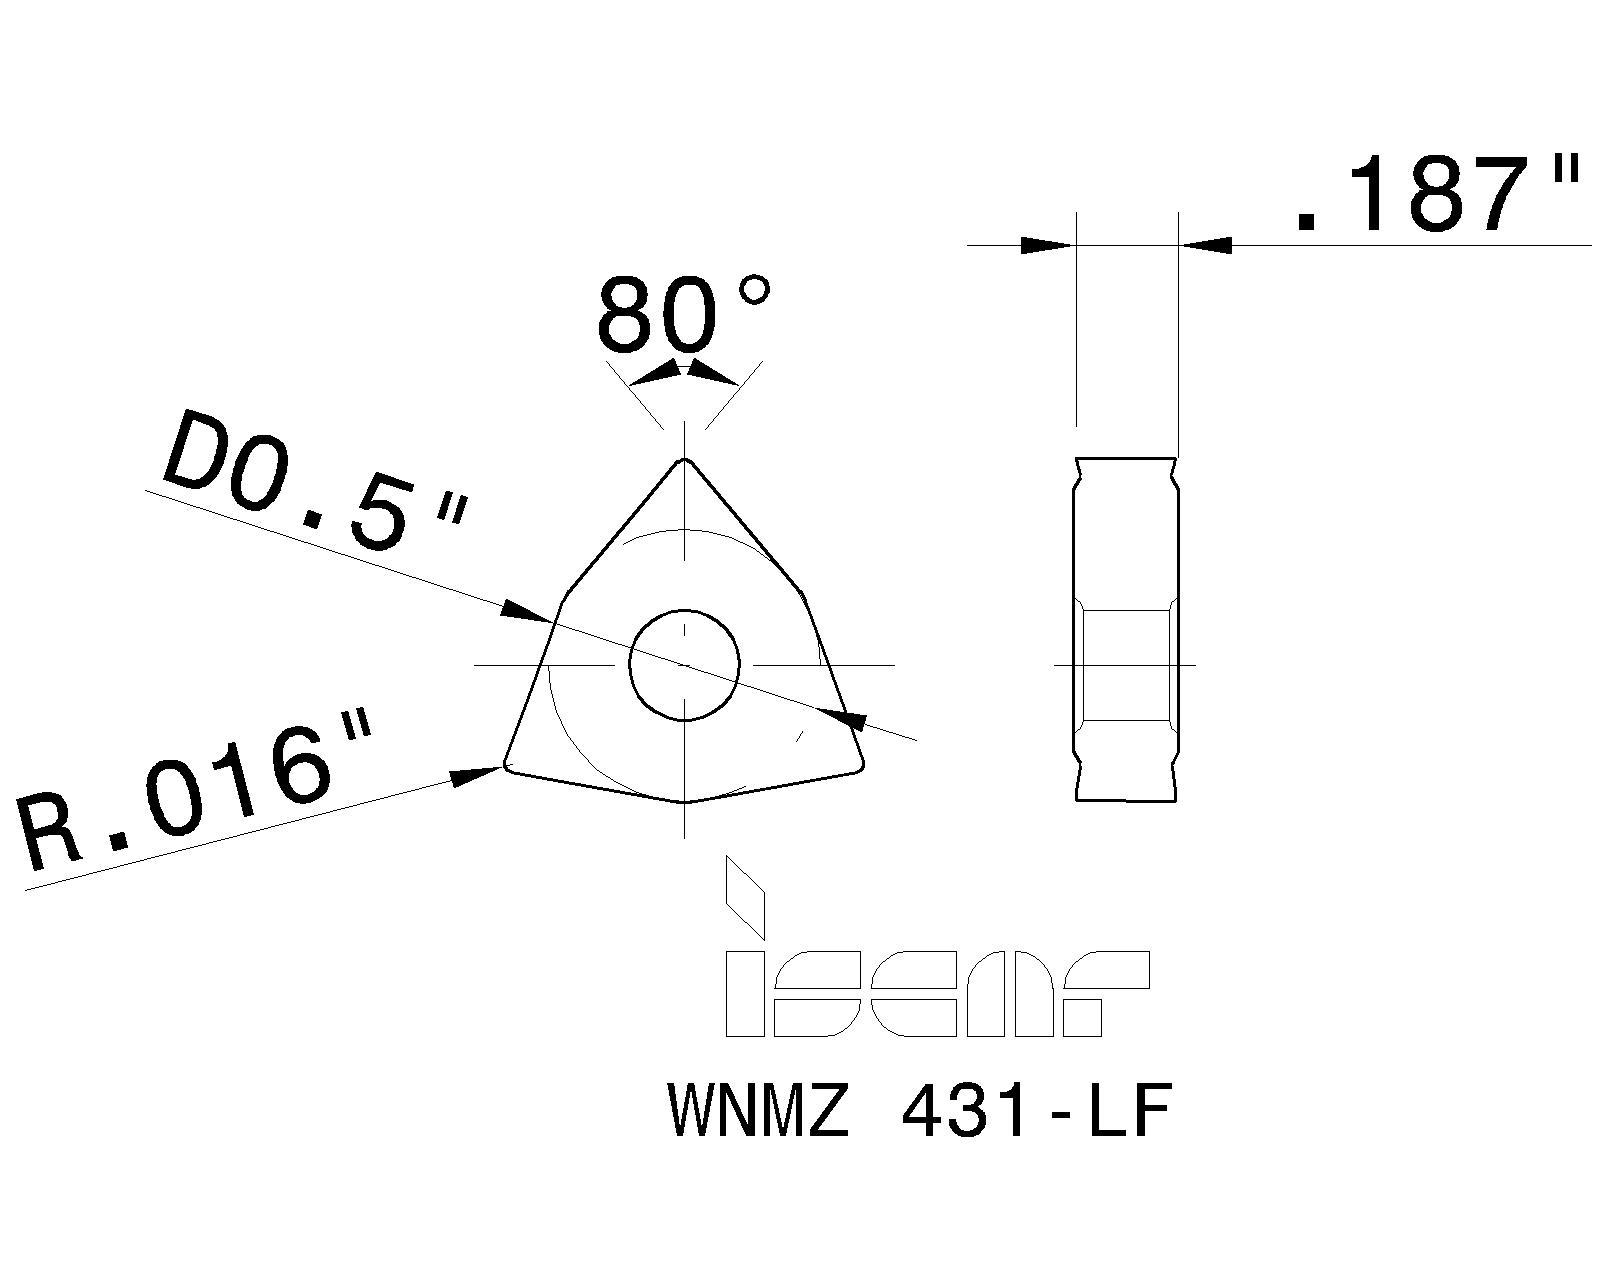 WNMZ 431 LF IC570 ISCAR INSERT